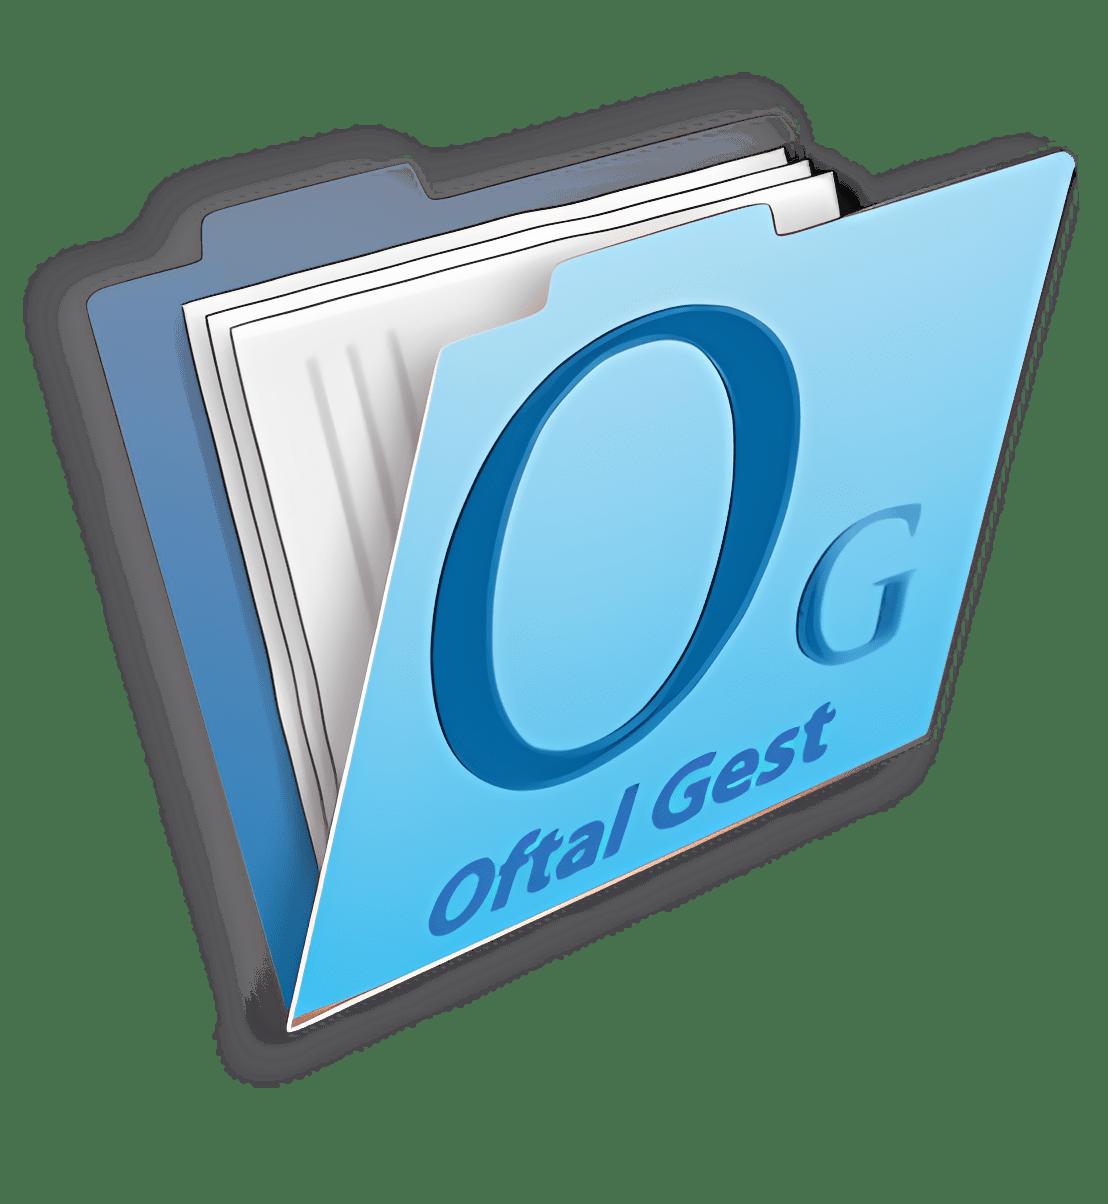 OftalGest